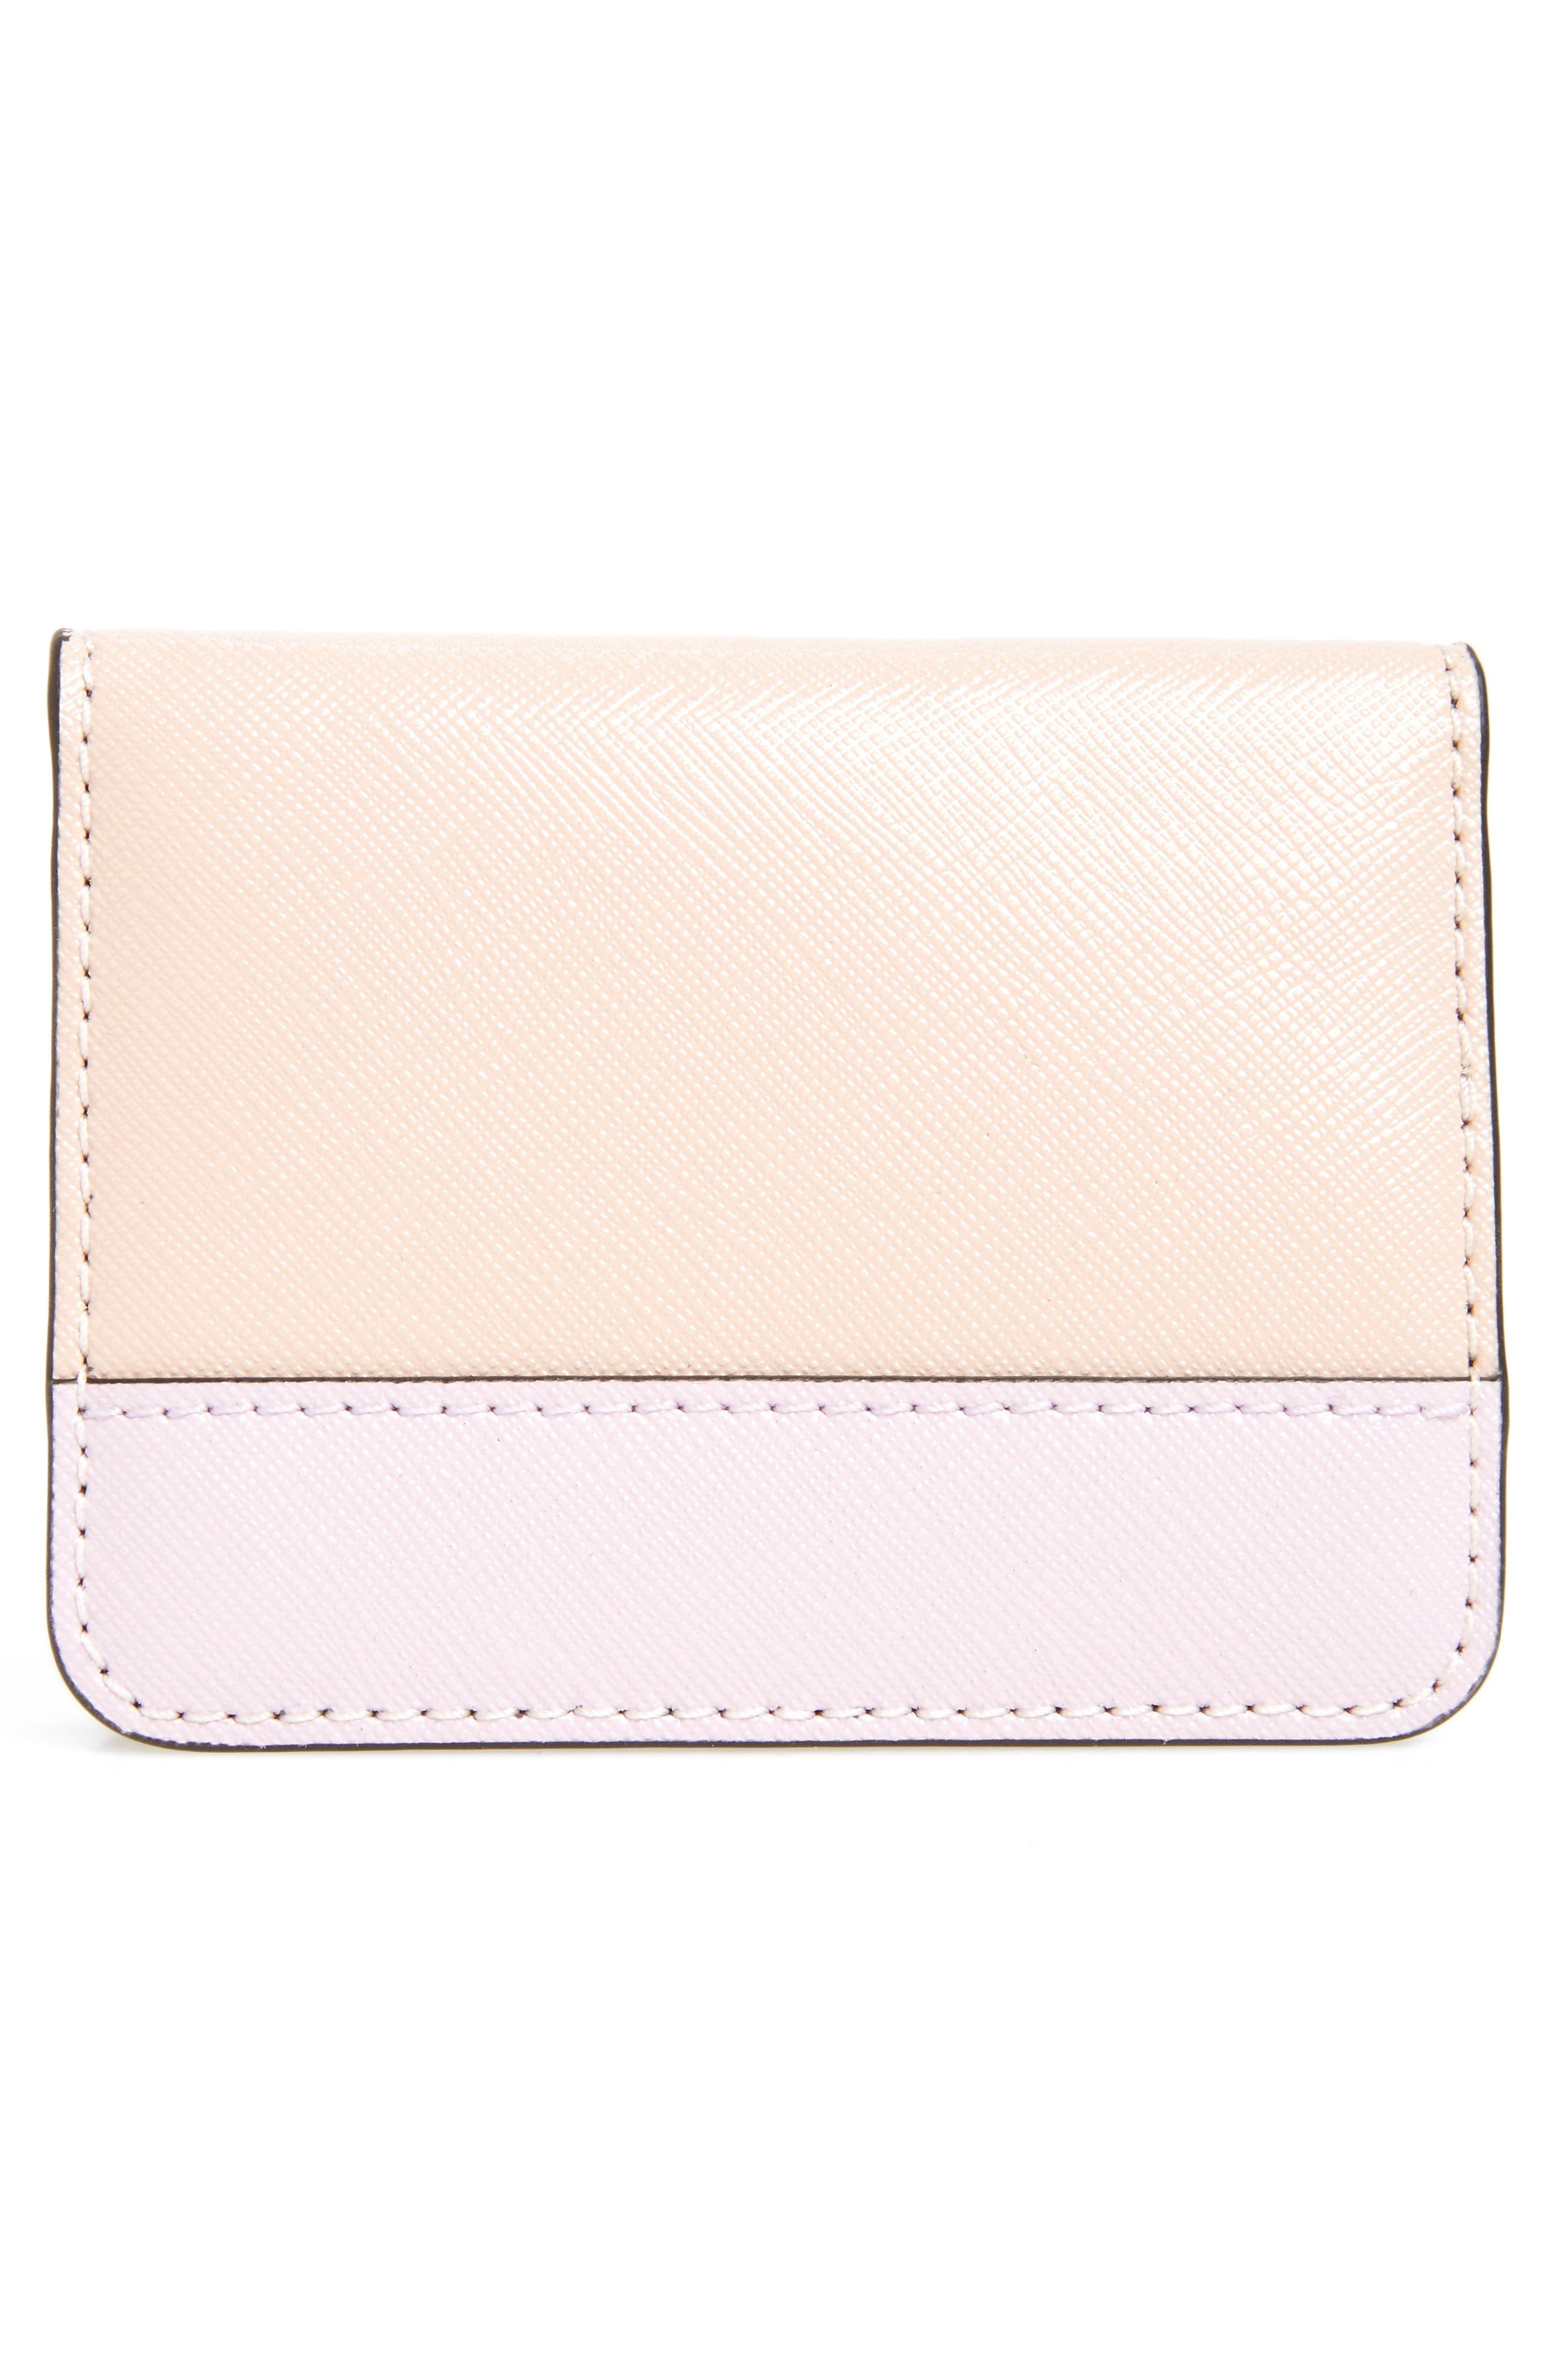 Color Block Saffiano Leather Business Card Case,                             Alternate thumbnail 4, color,                             Pale Pink Multi